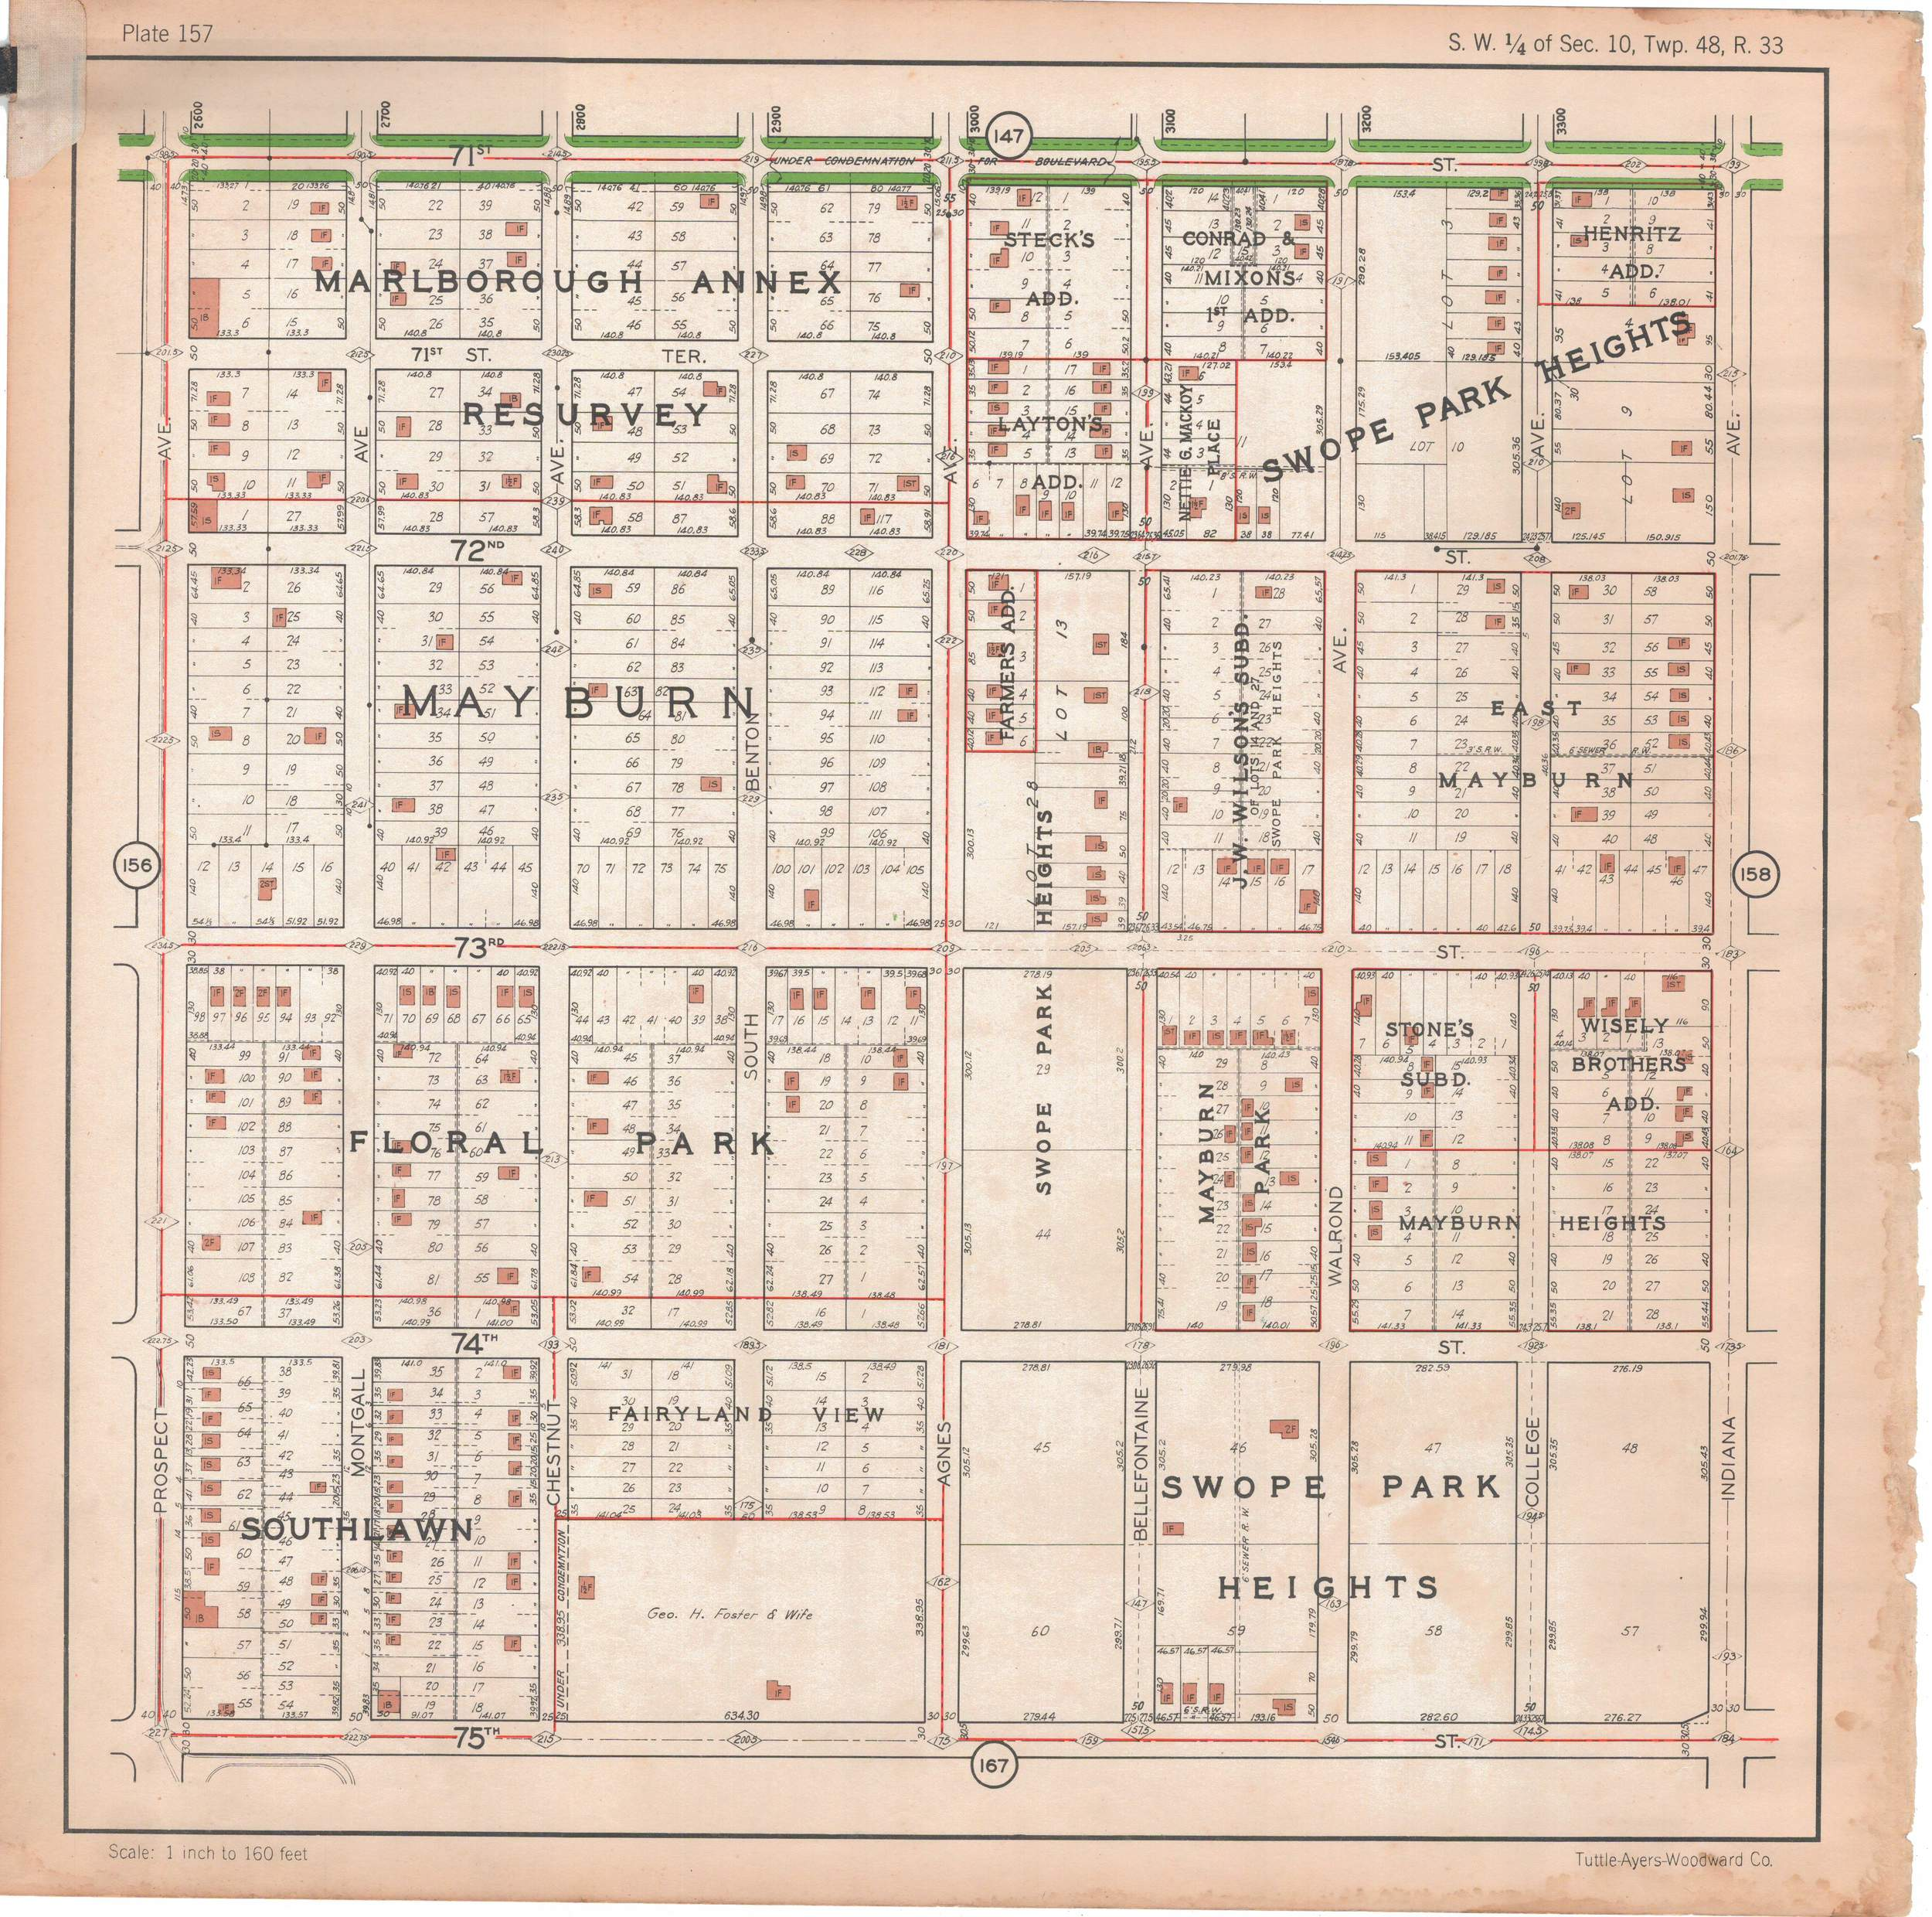 1925 TUTTLE_AYERS_Plate_157.JPG